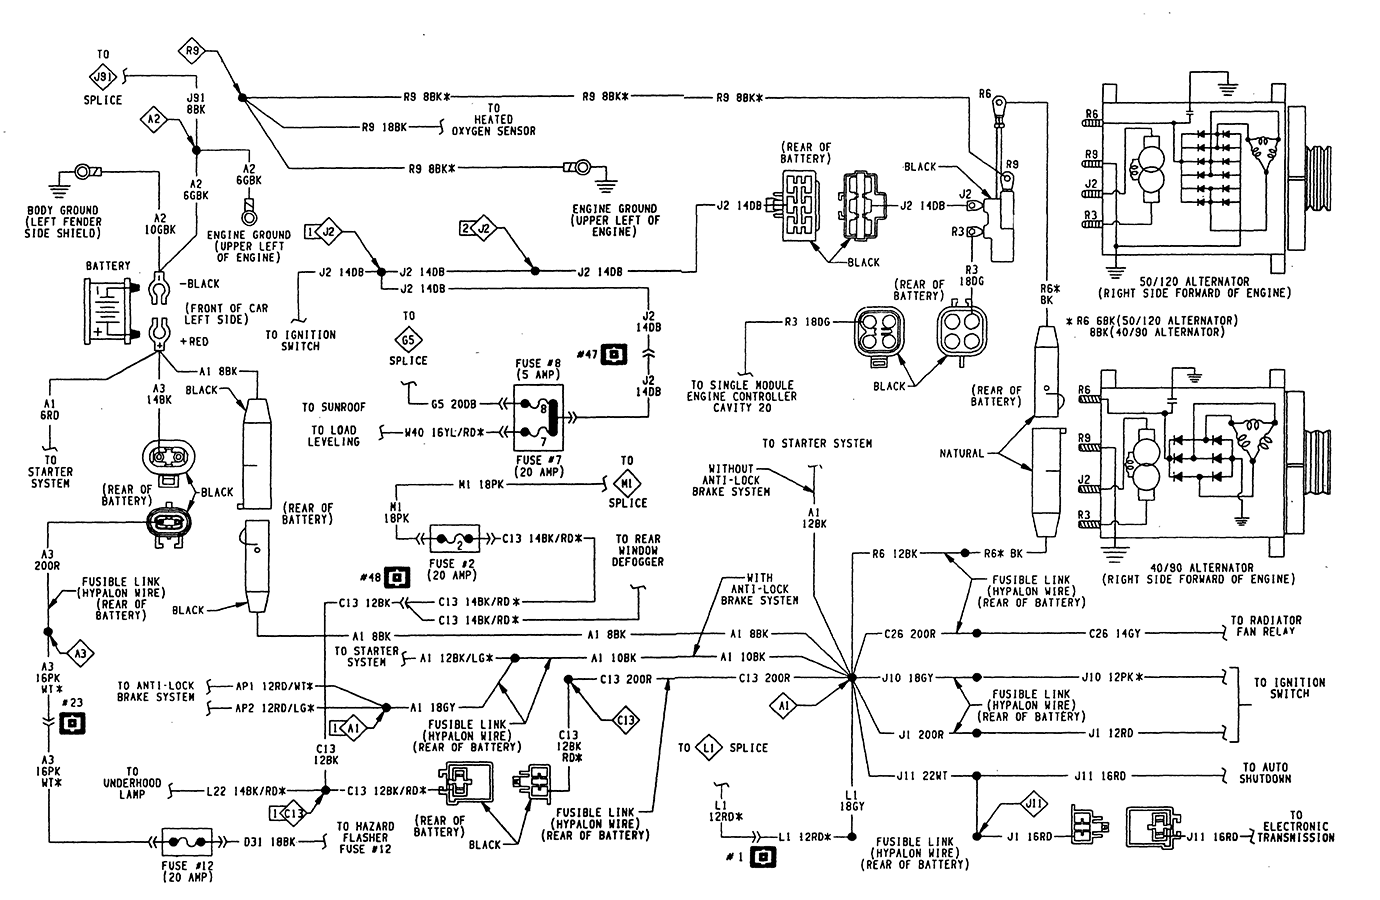 fed6404c-e0fb-4daf-8f4c-4182bce88ab8_chrysler.png